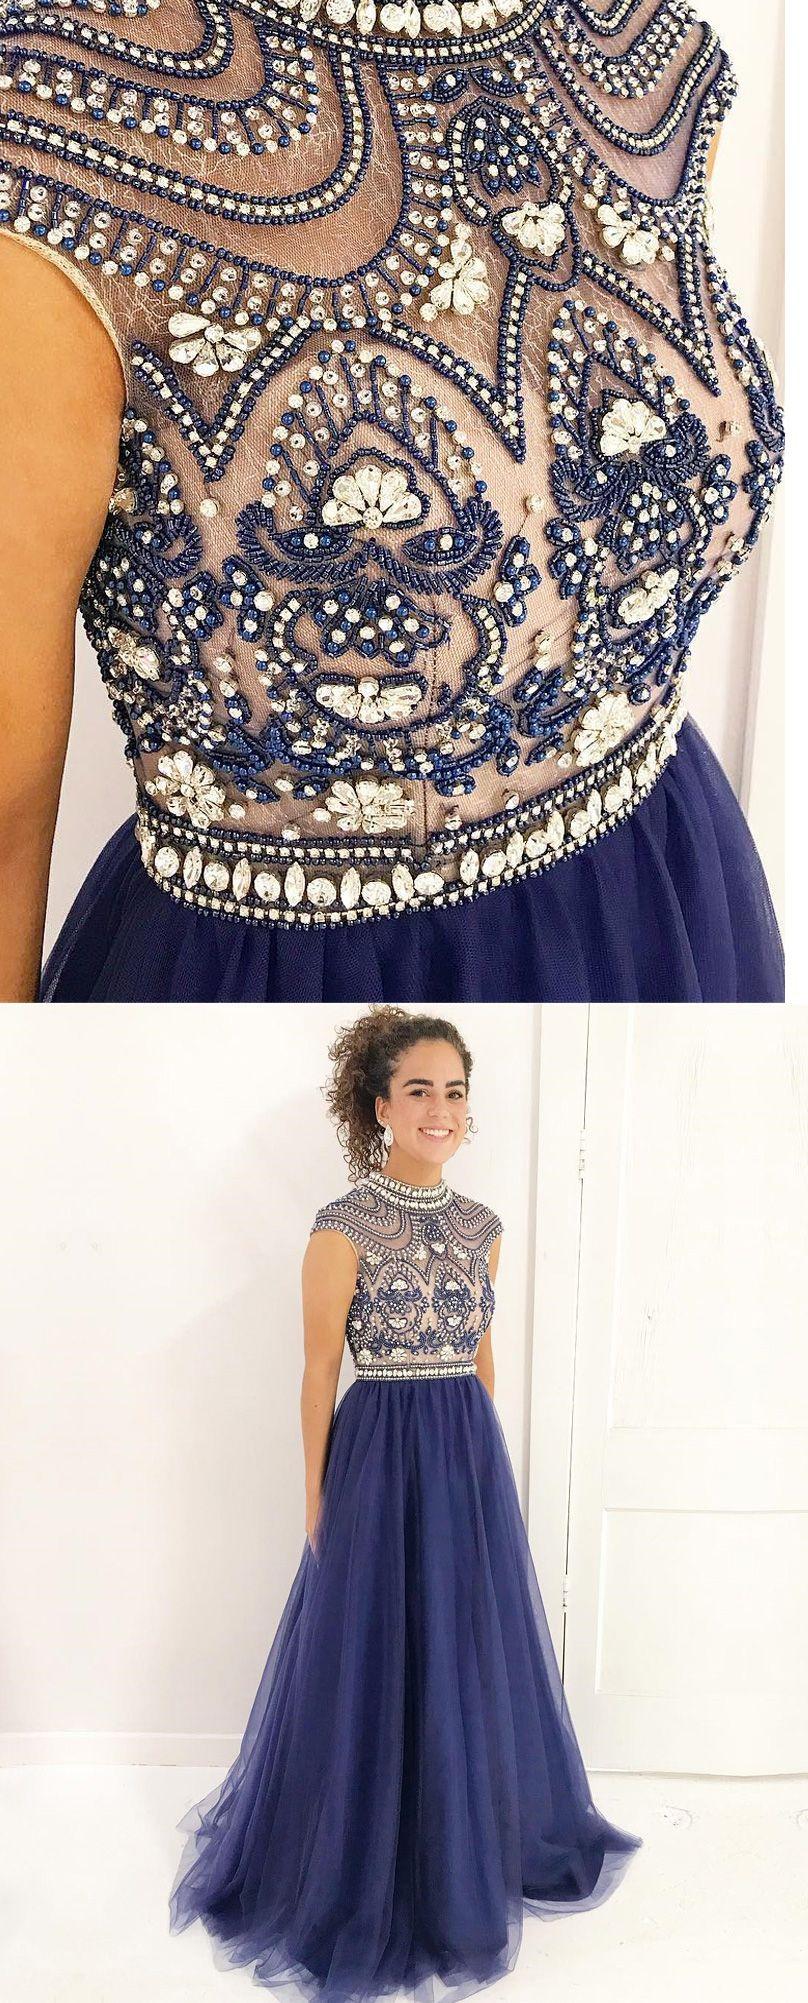 dc26bb57f68 High Neck Cap Sleeves Navy Blue Beaded Prom Evening Dress   promdresses promdresses2018 navybluepromdresses highneck beadedpromdresses eveningdresses2018   ...